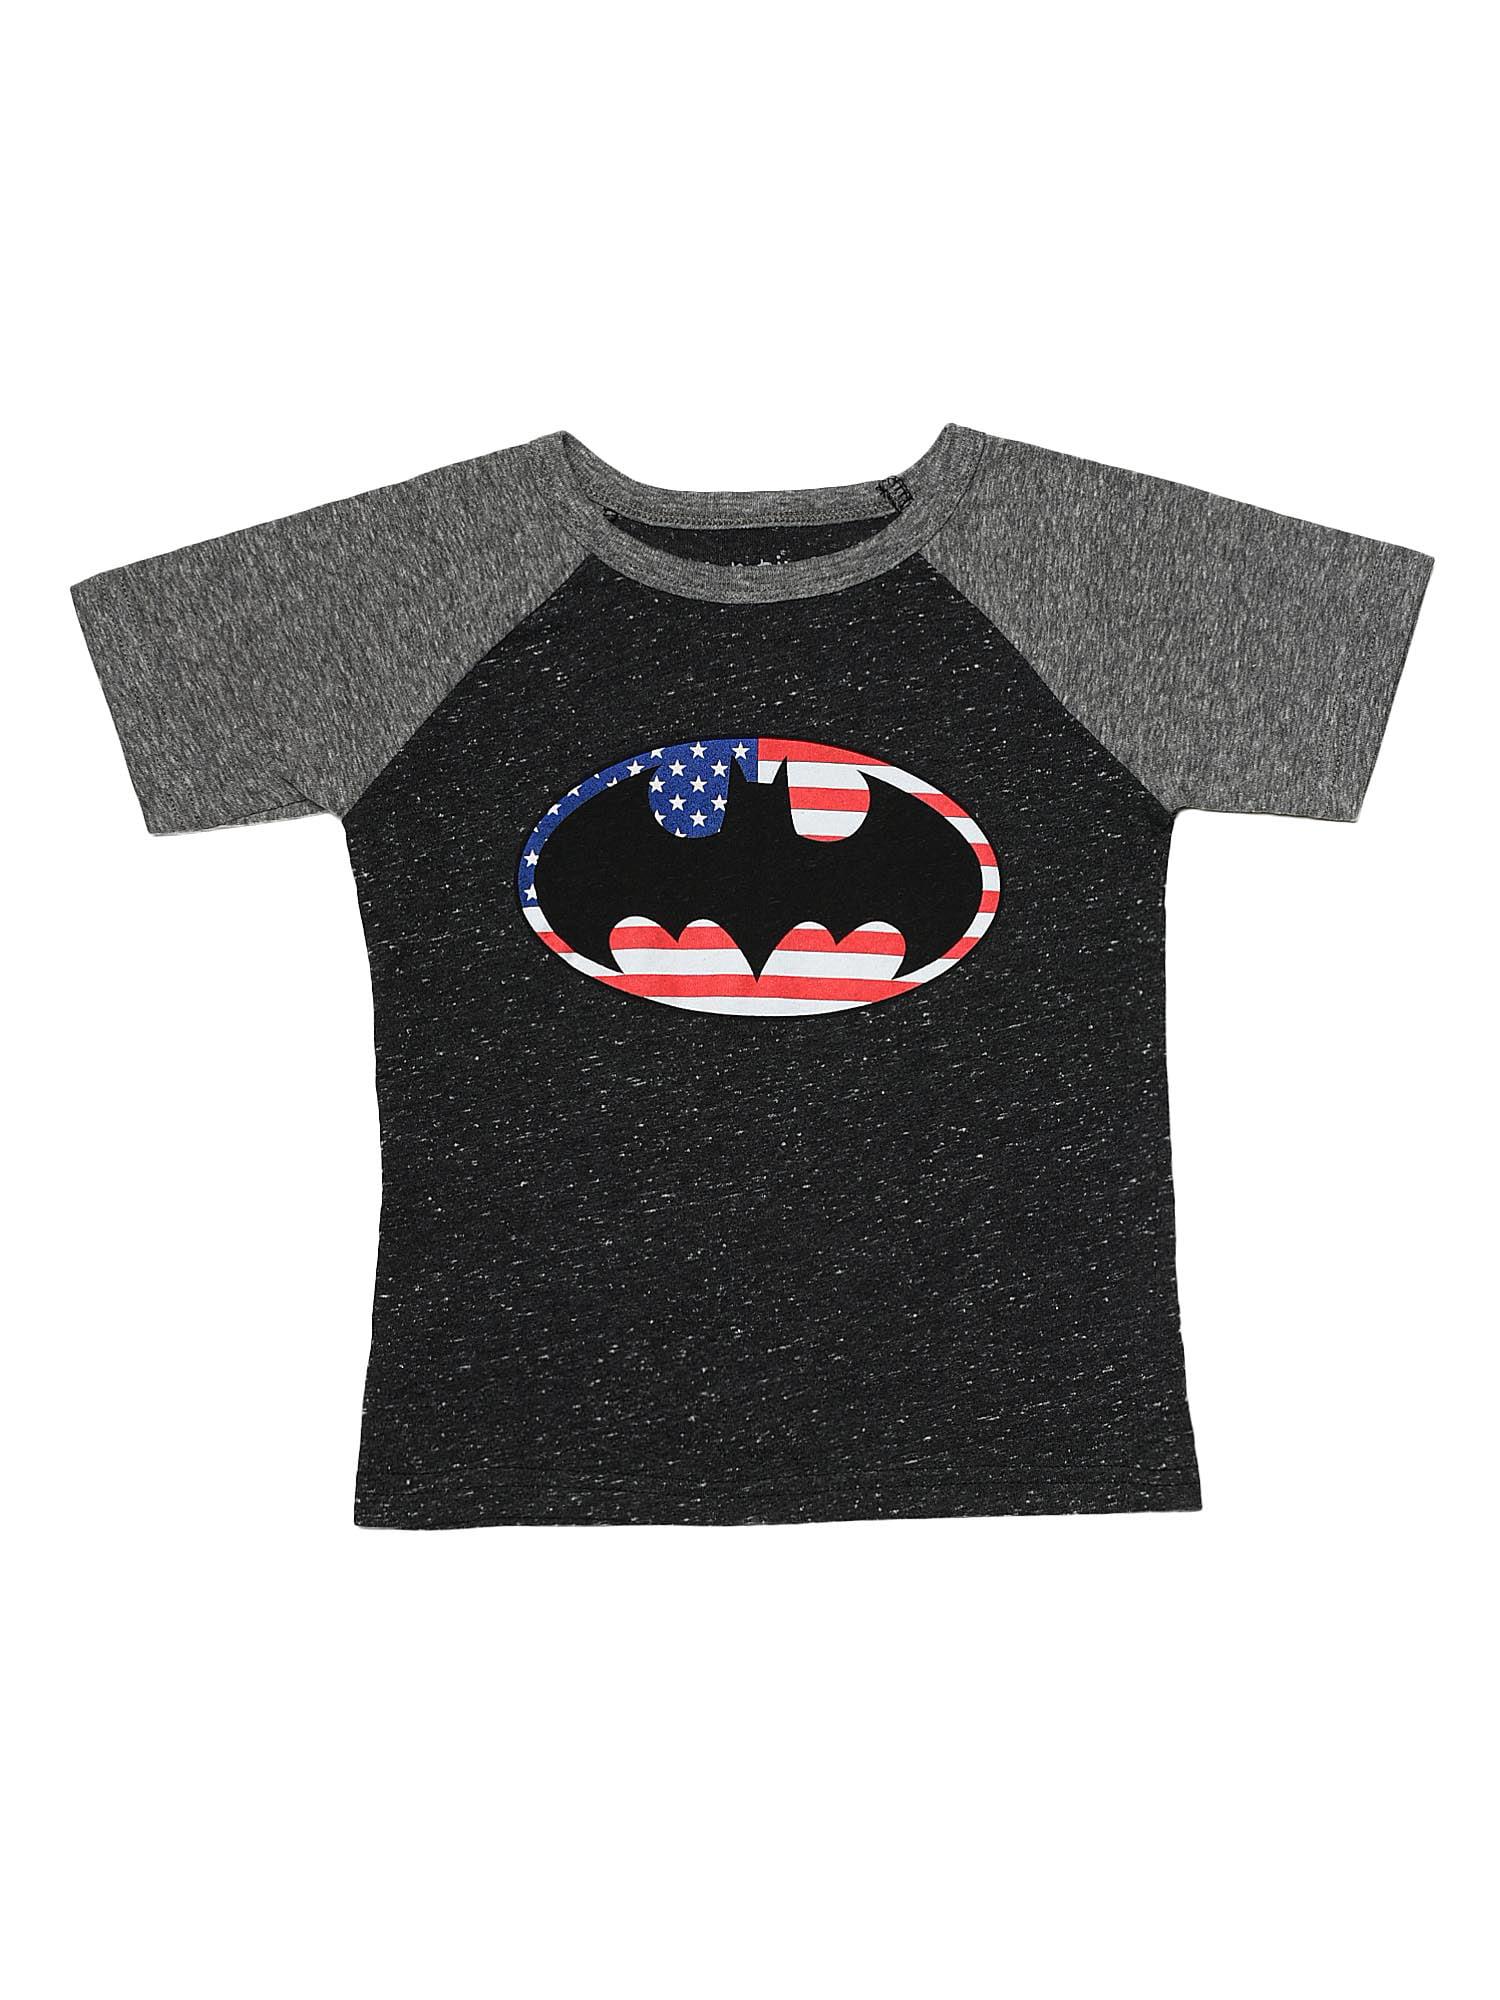 Toddler Boys Batman Logo Raglan Shirt Gray USA Flag